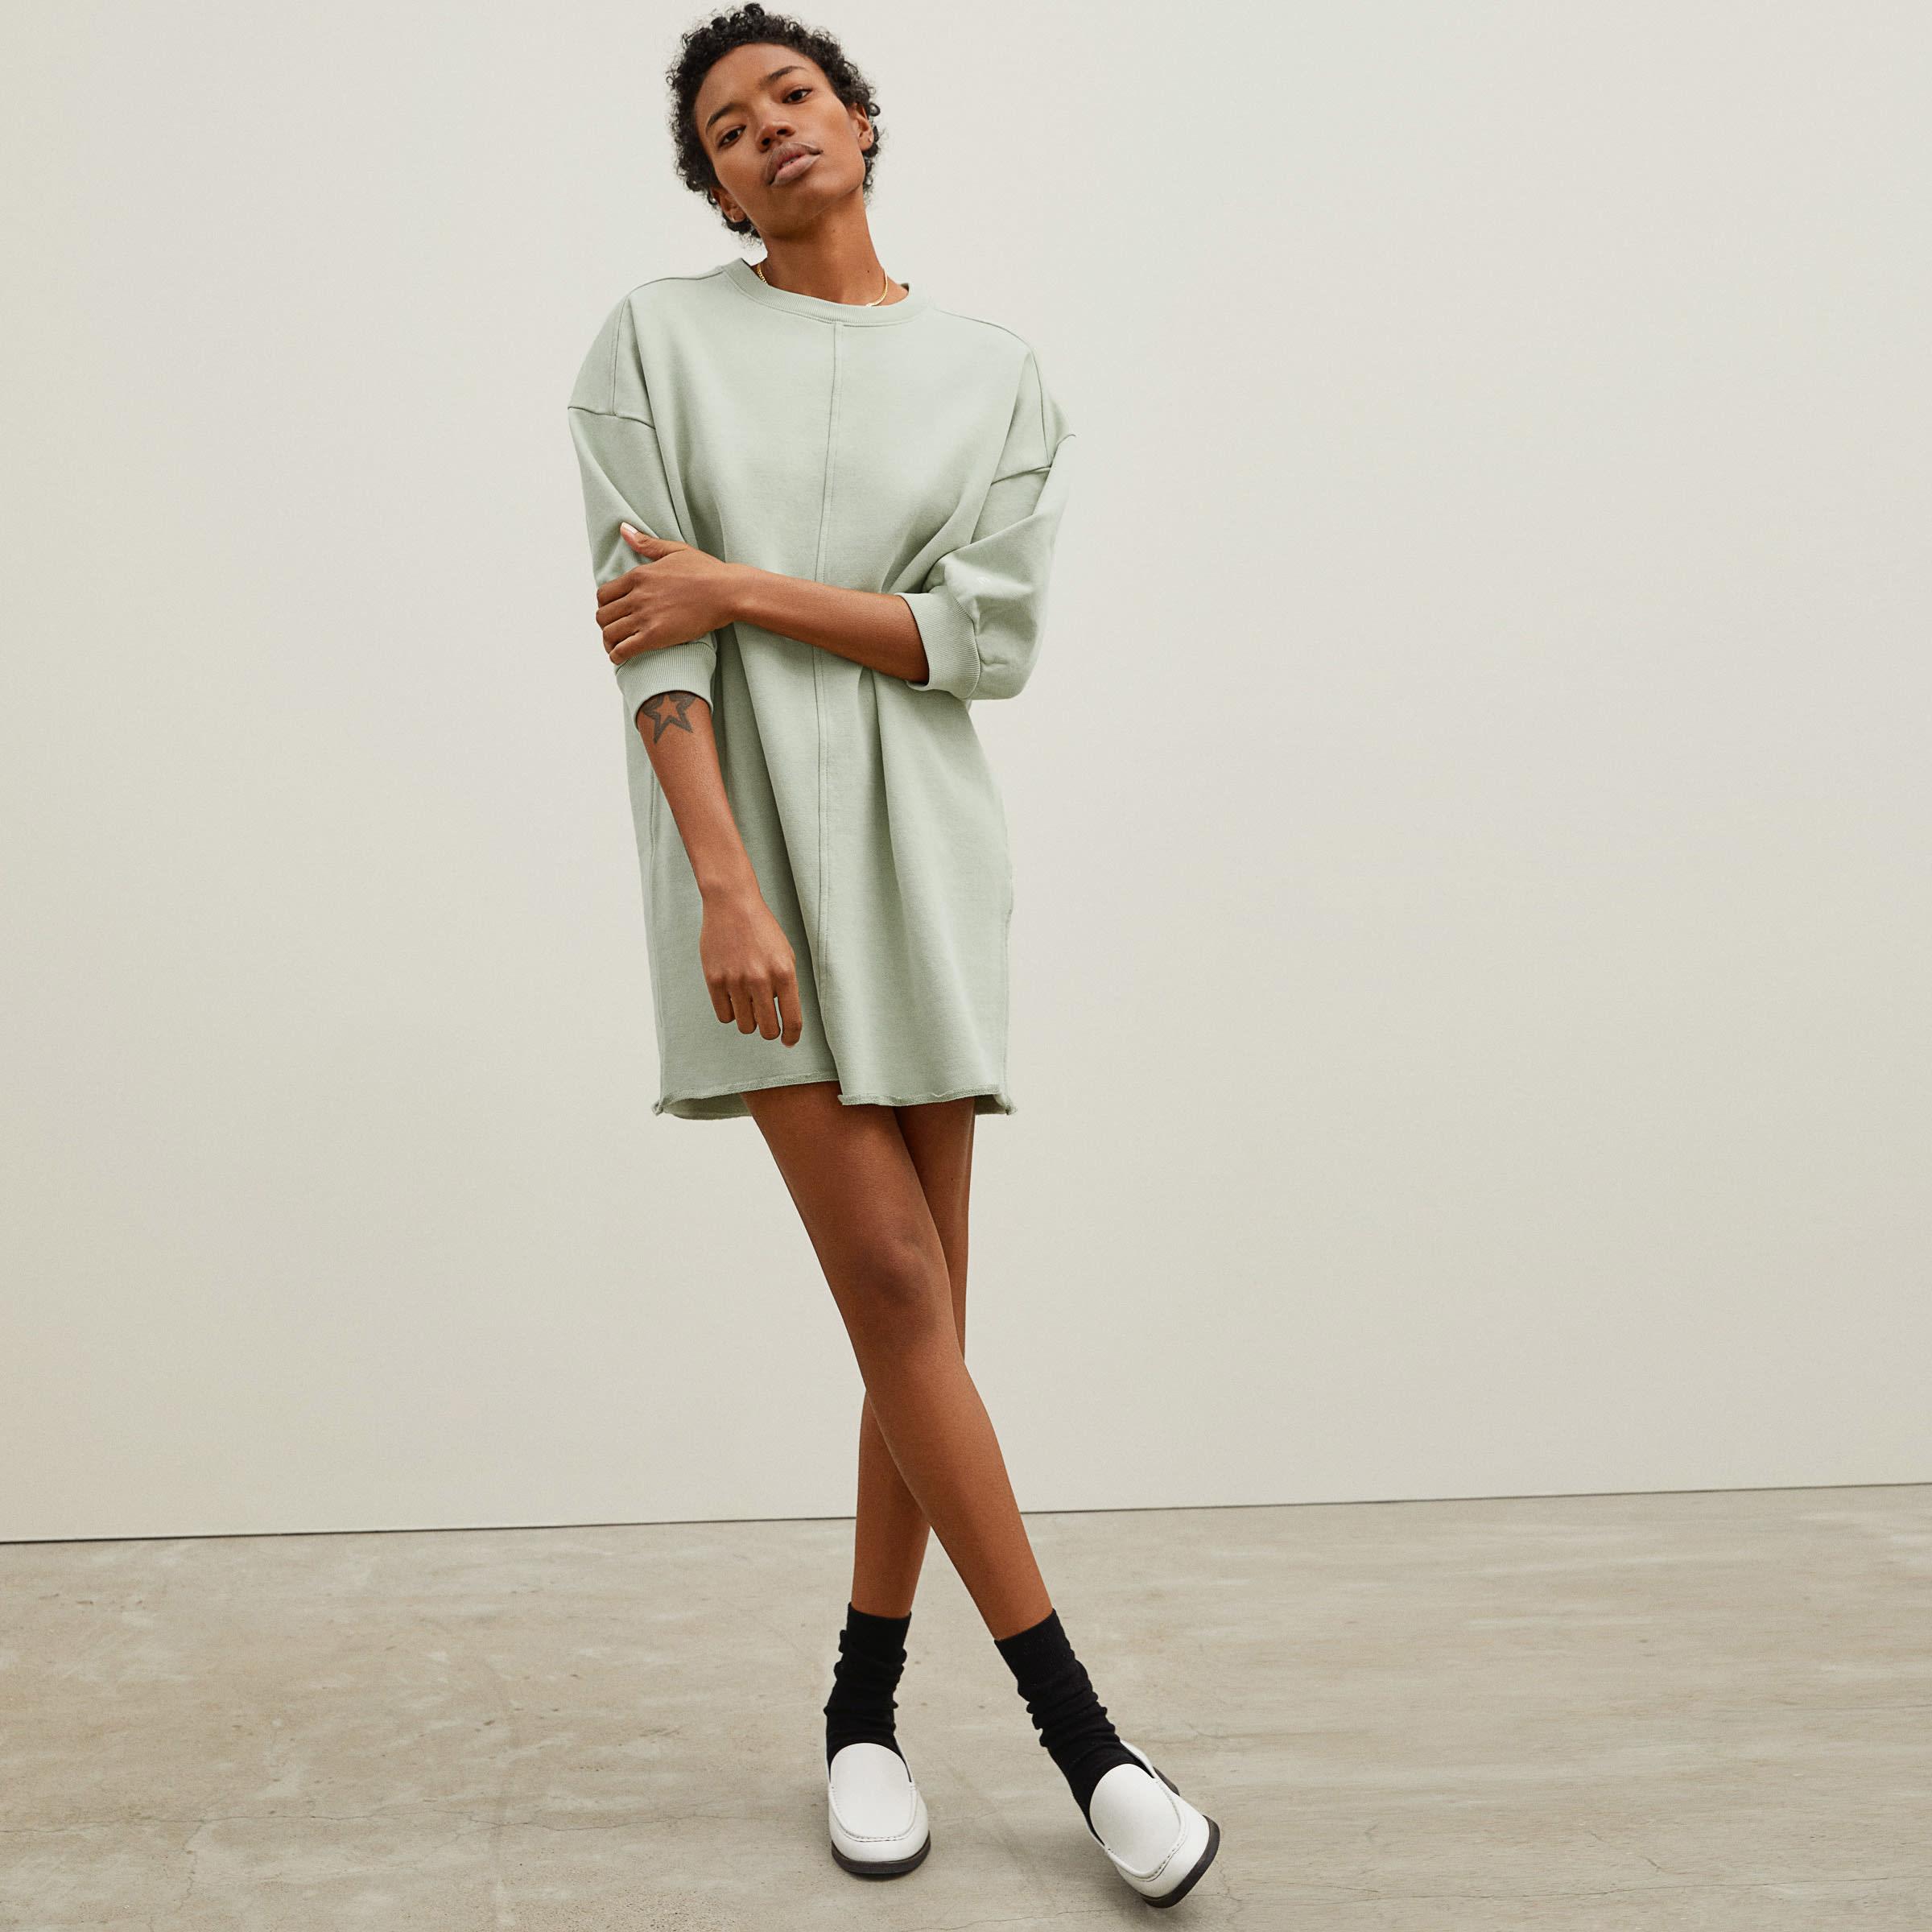 a model in a sage green long sleeve dress